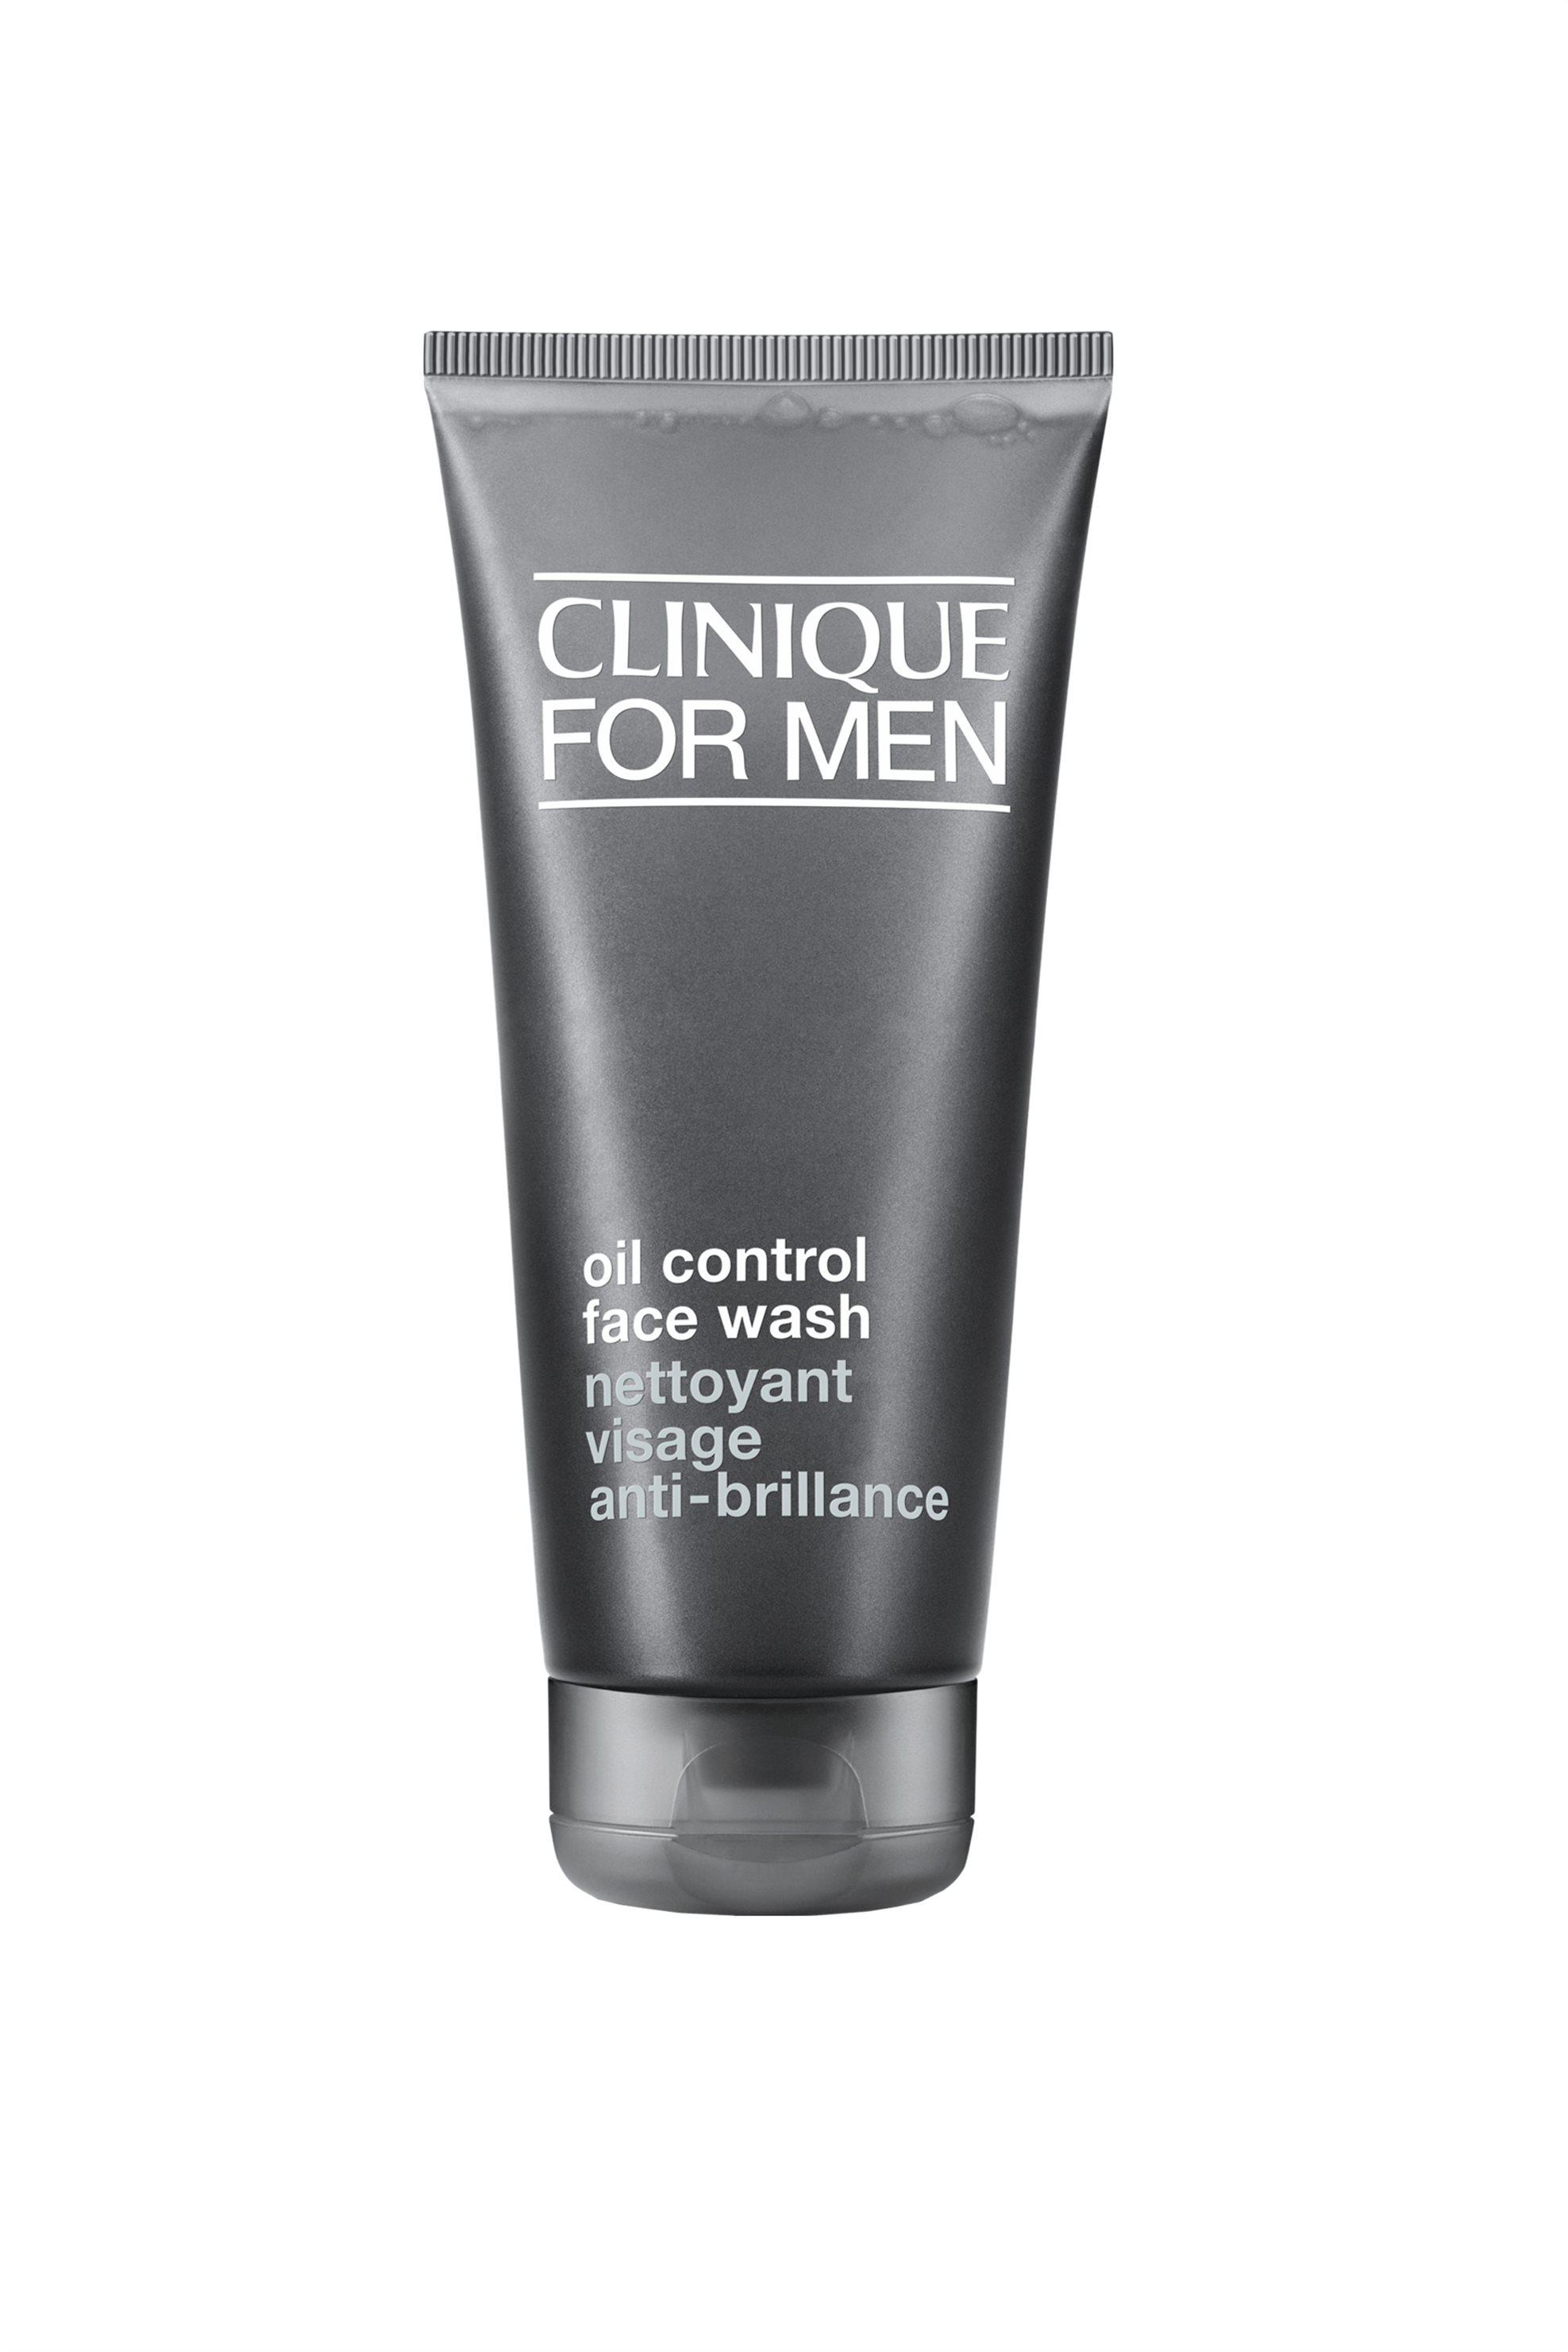 Clinique Clinique For Men™ Oil Control Face Wash 200 ml - Z4KJ010000 ομορφια   καλλυντικα επιλεκτικησ   ανδρική περιποίηση   περιποίηση προσώπου